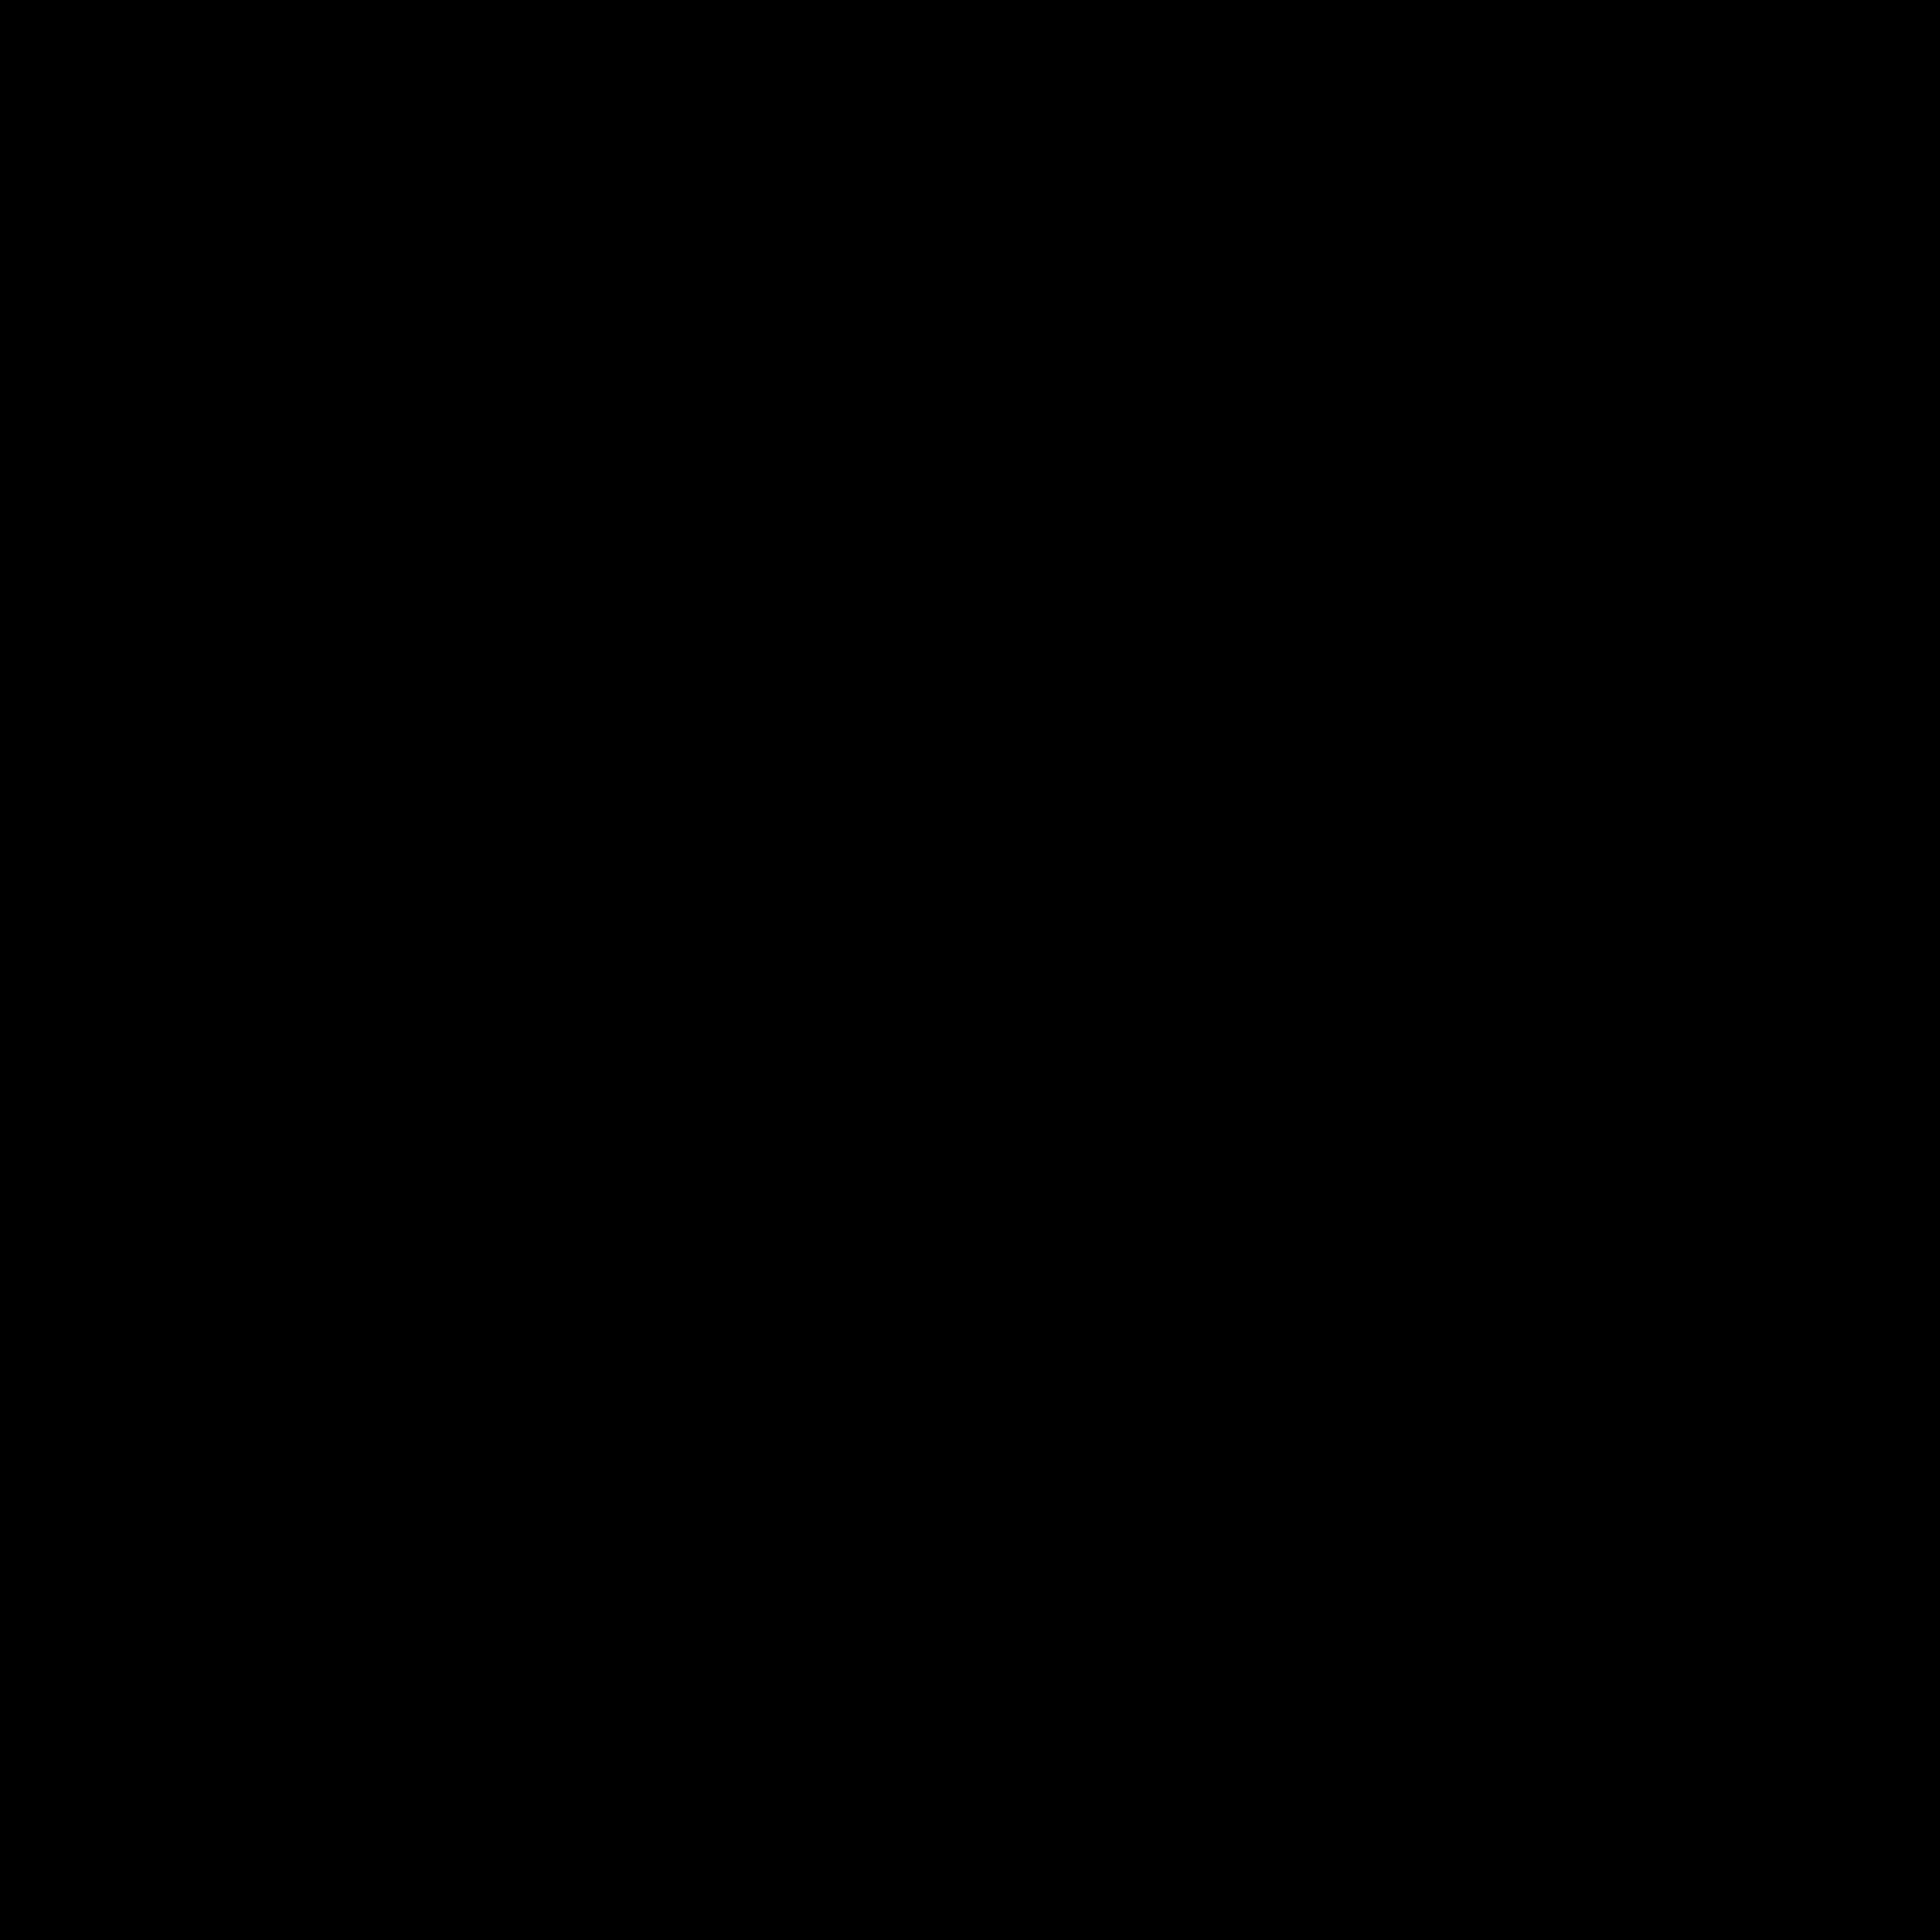 Clipart trumpet image 2